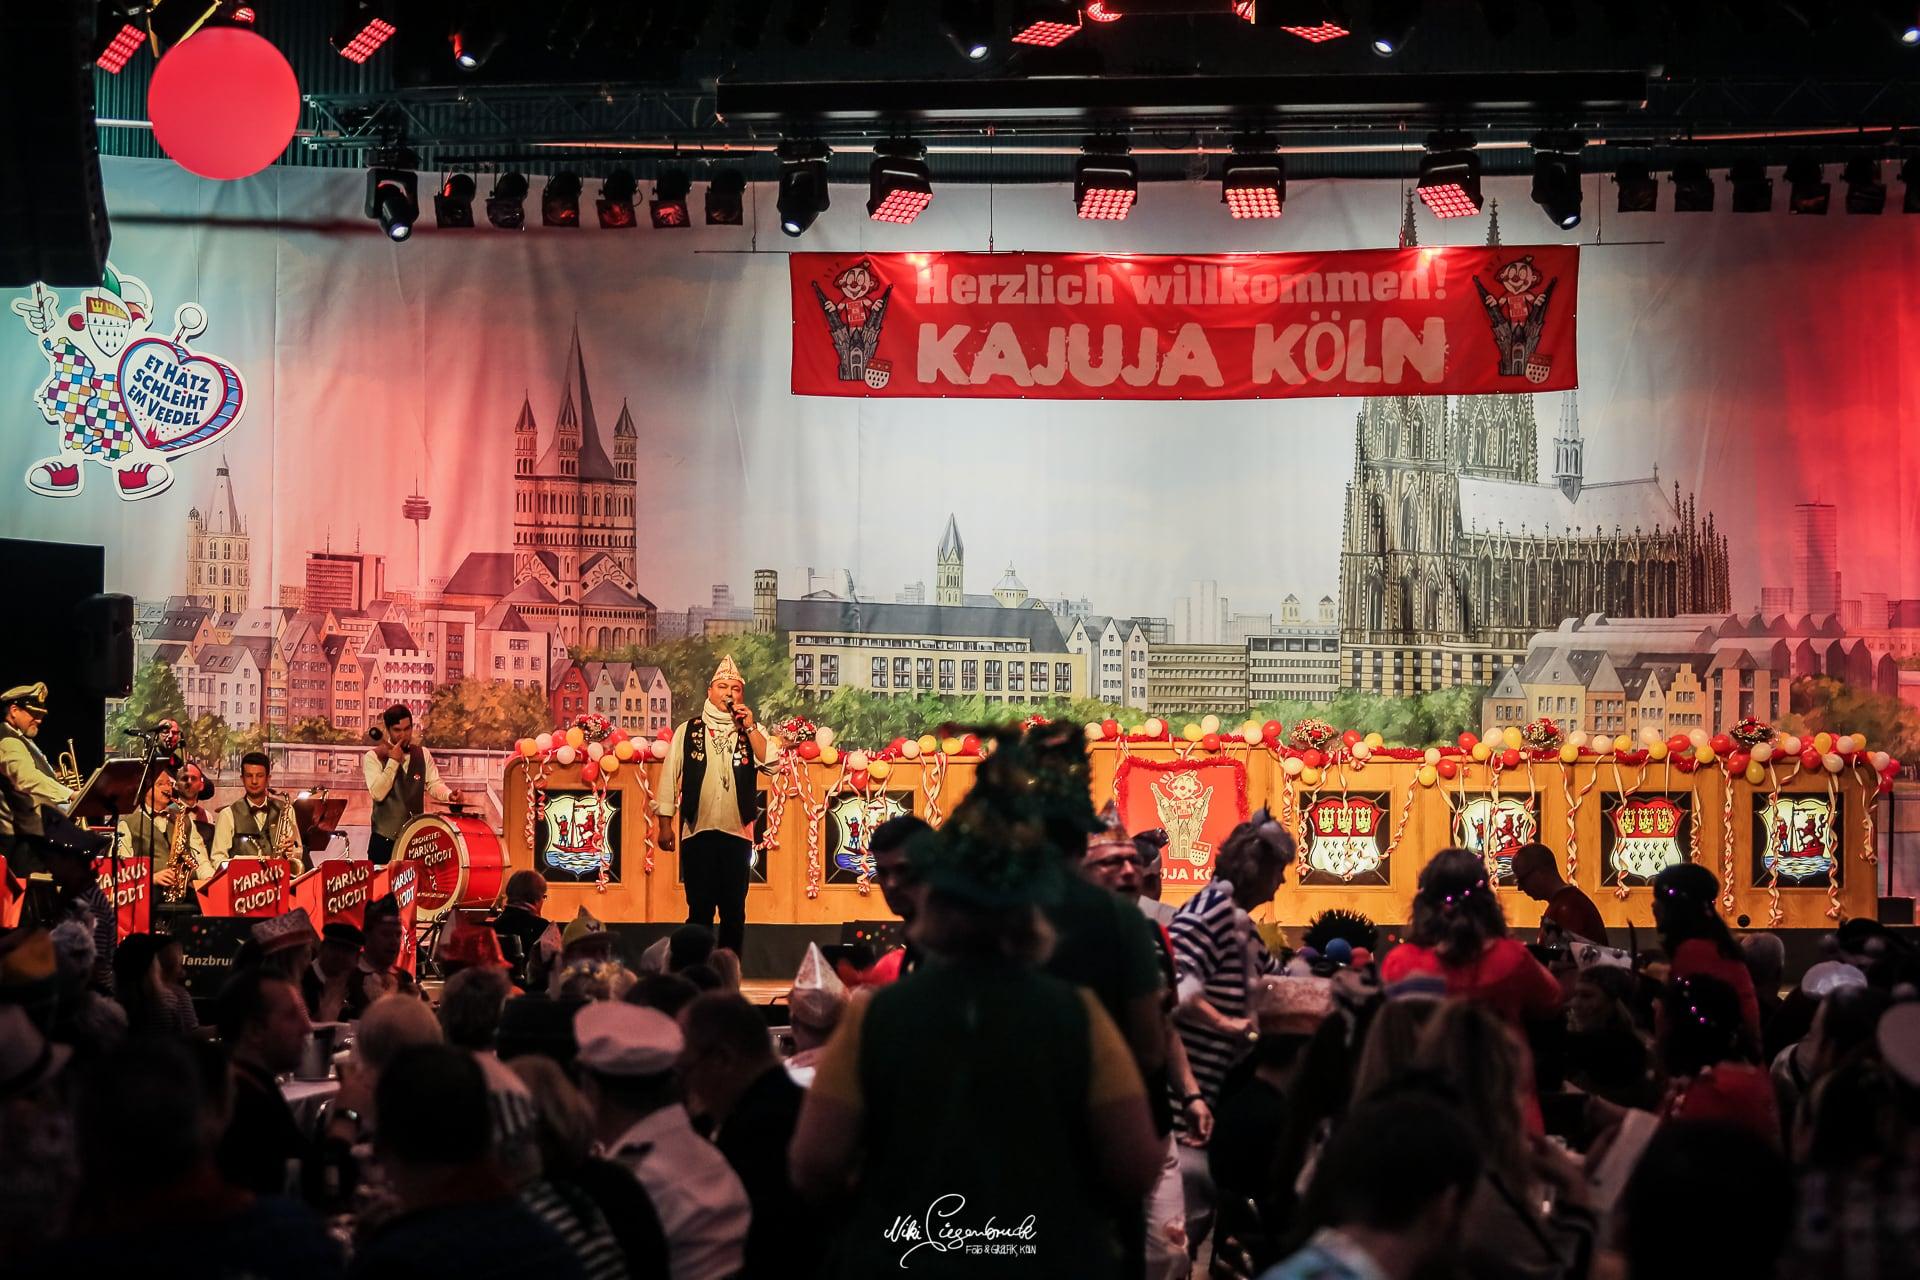 Kajuja Köln